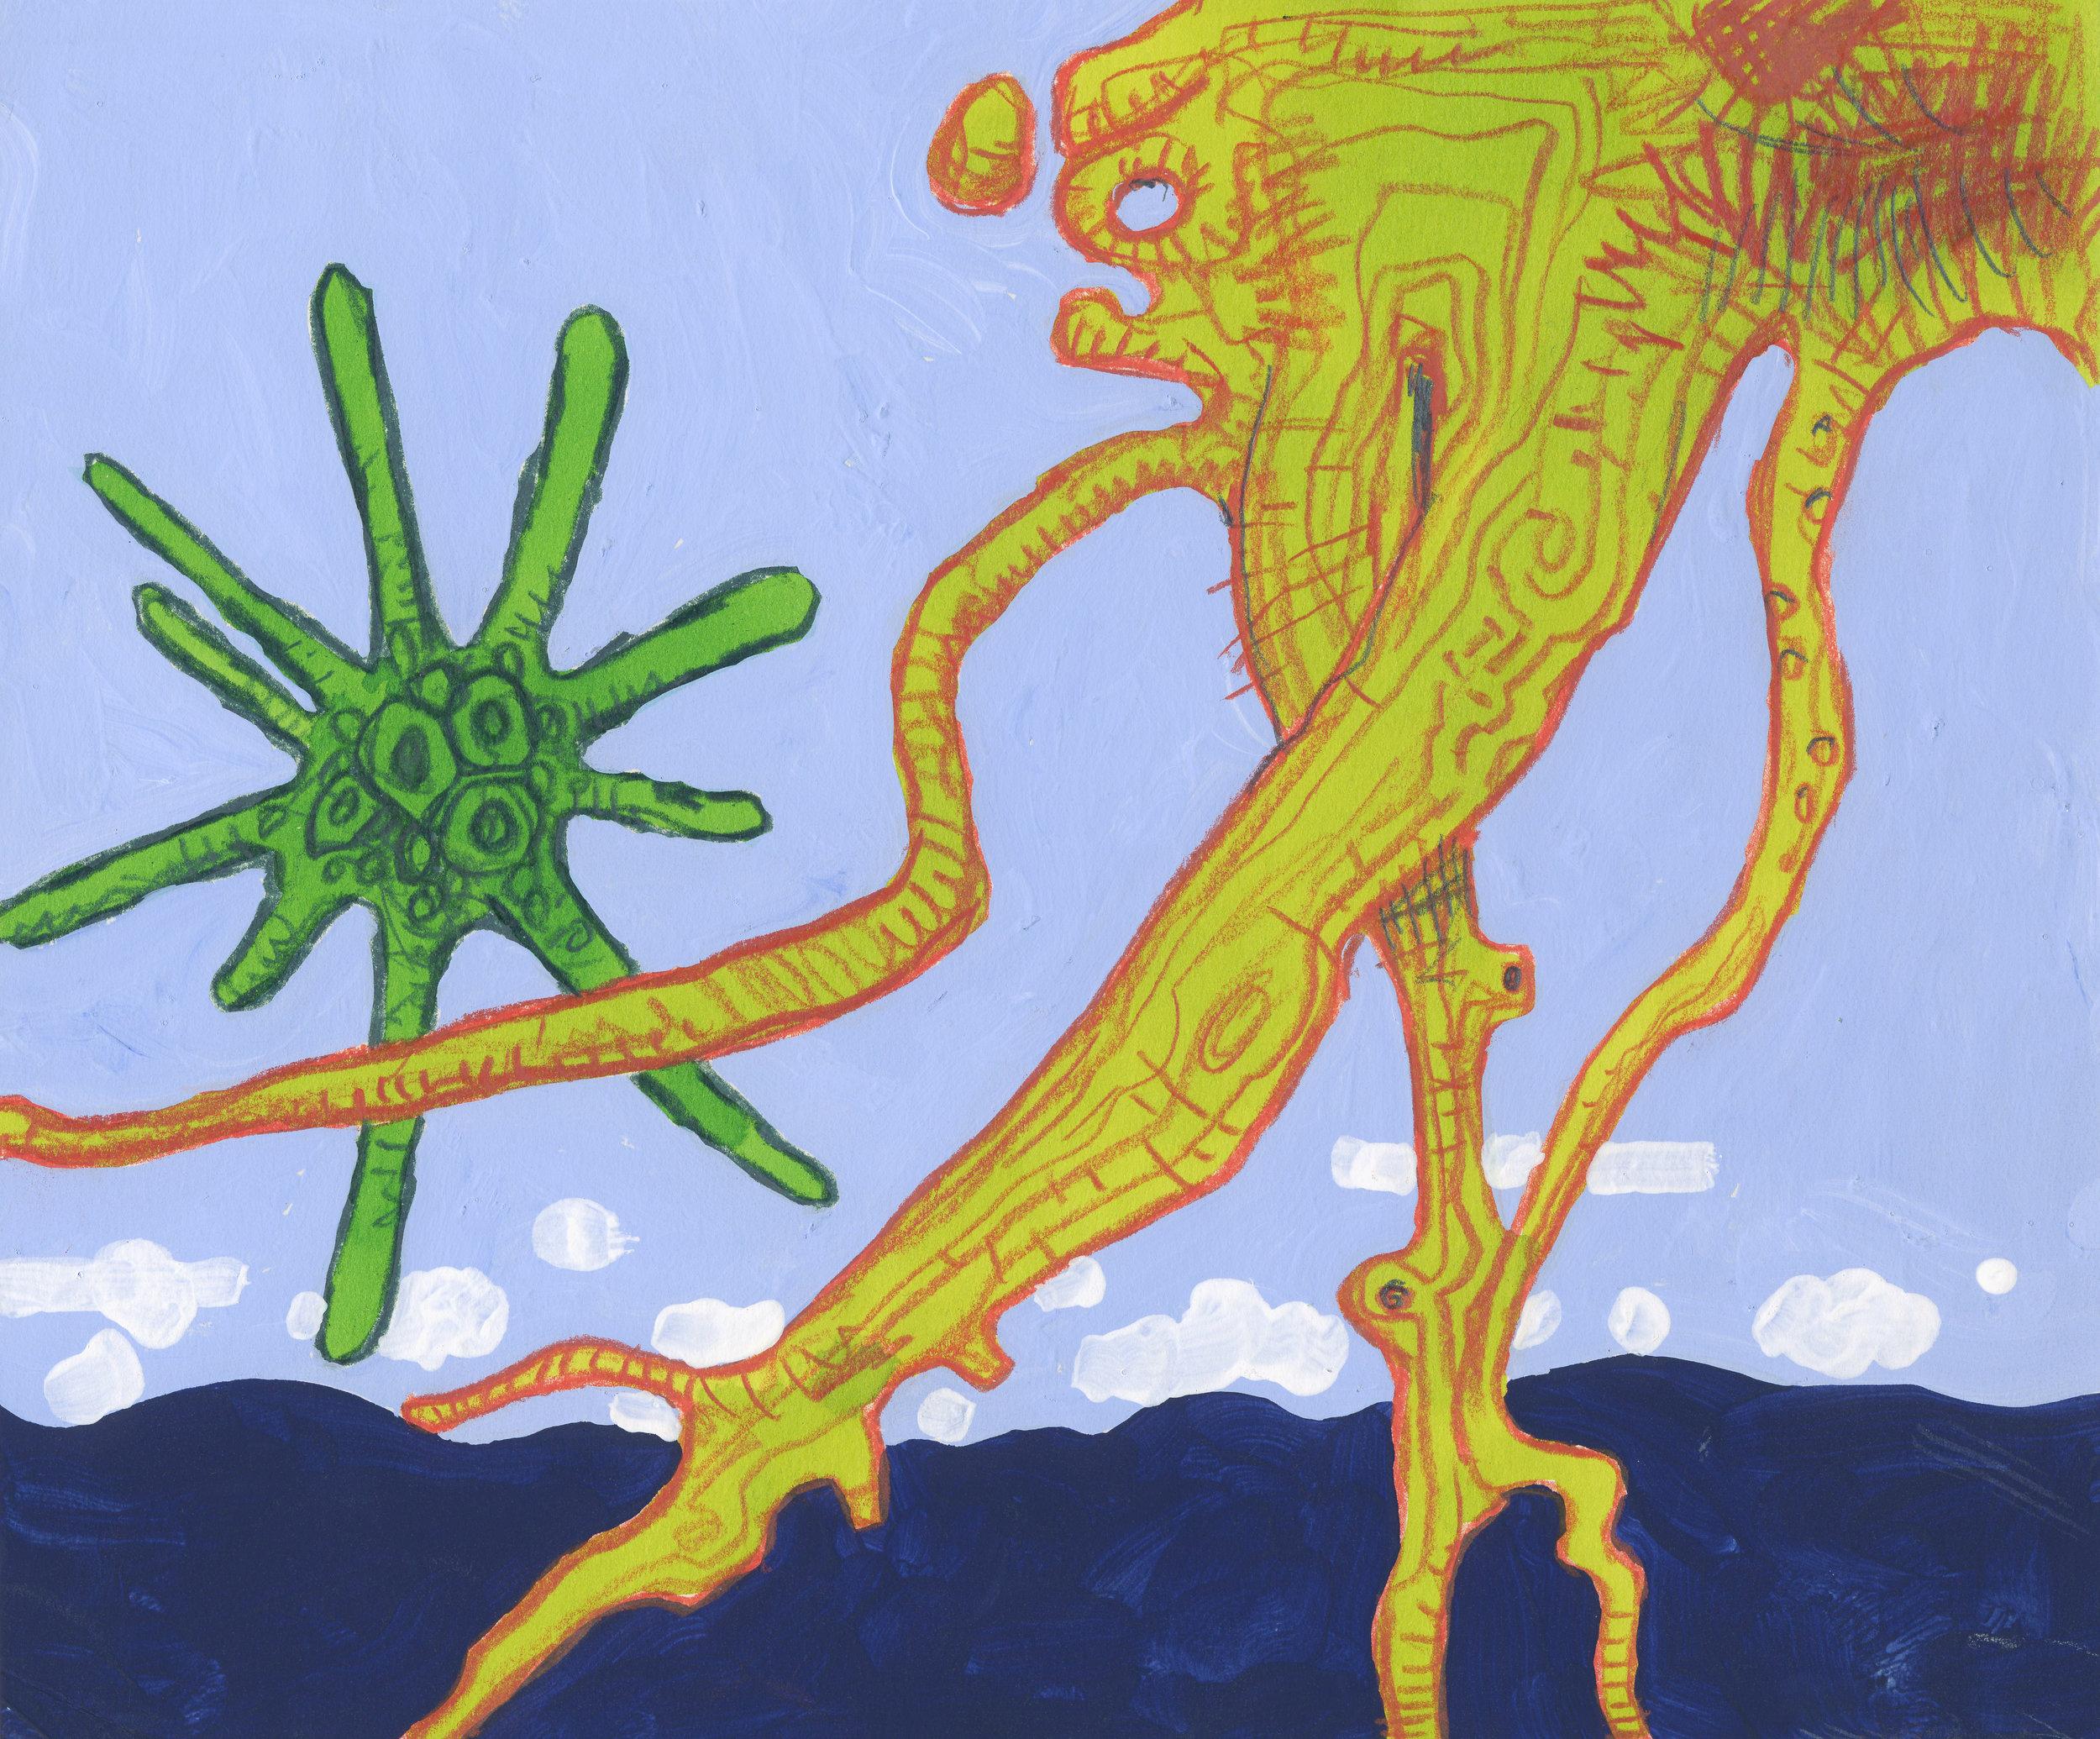 Alexandr Ross, Squinado, 2013, flashe, crayon, watercolor, 8 1/2 x 10 inches